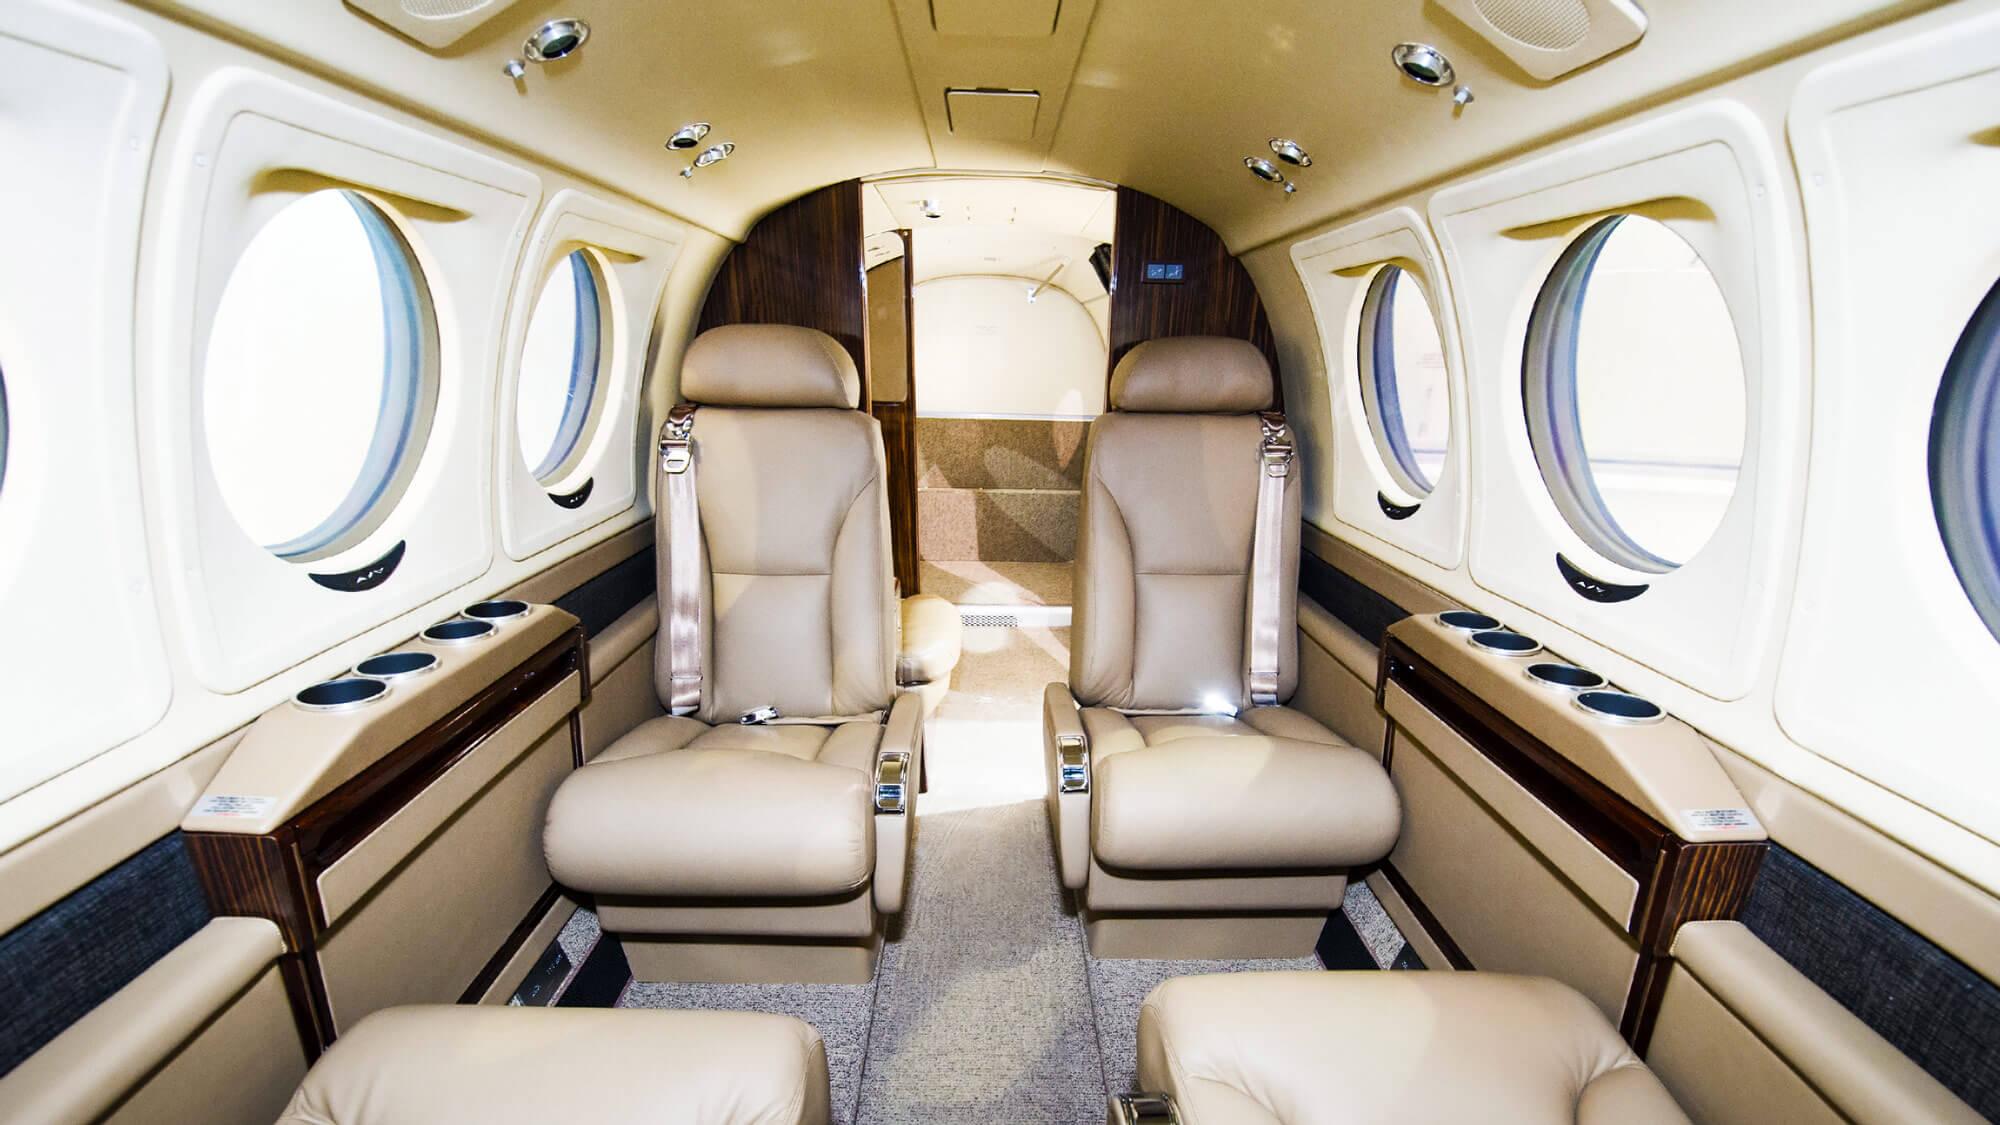 Interior of the Beechcraft King Air